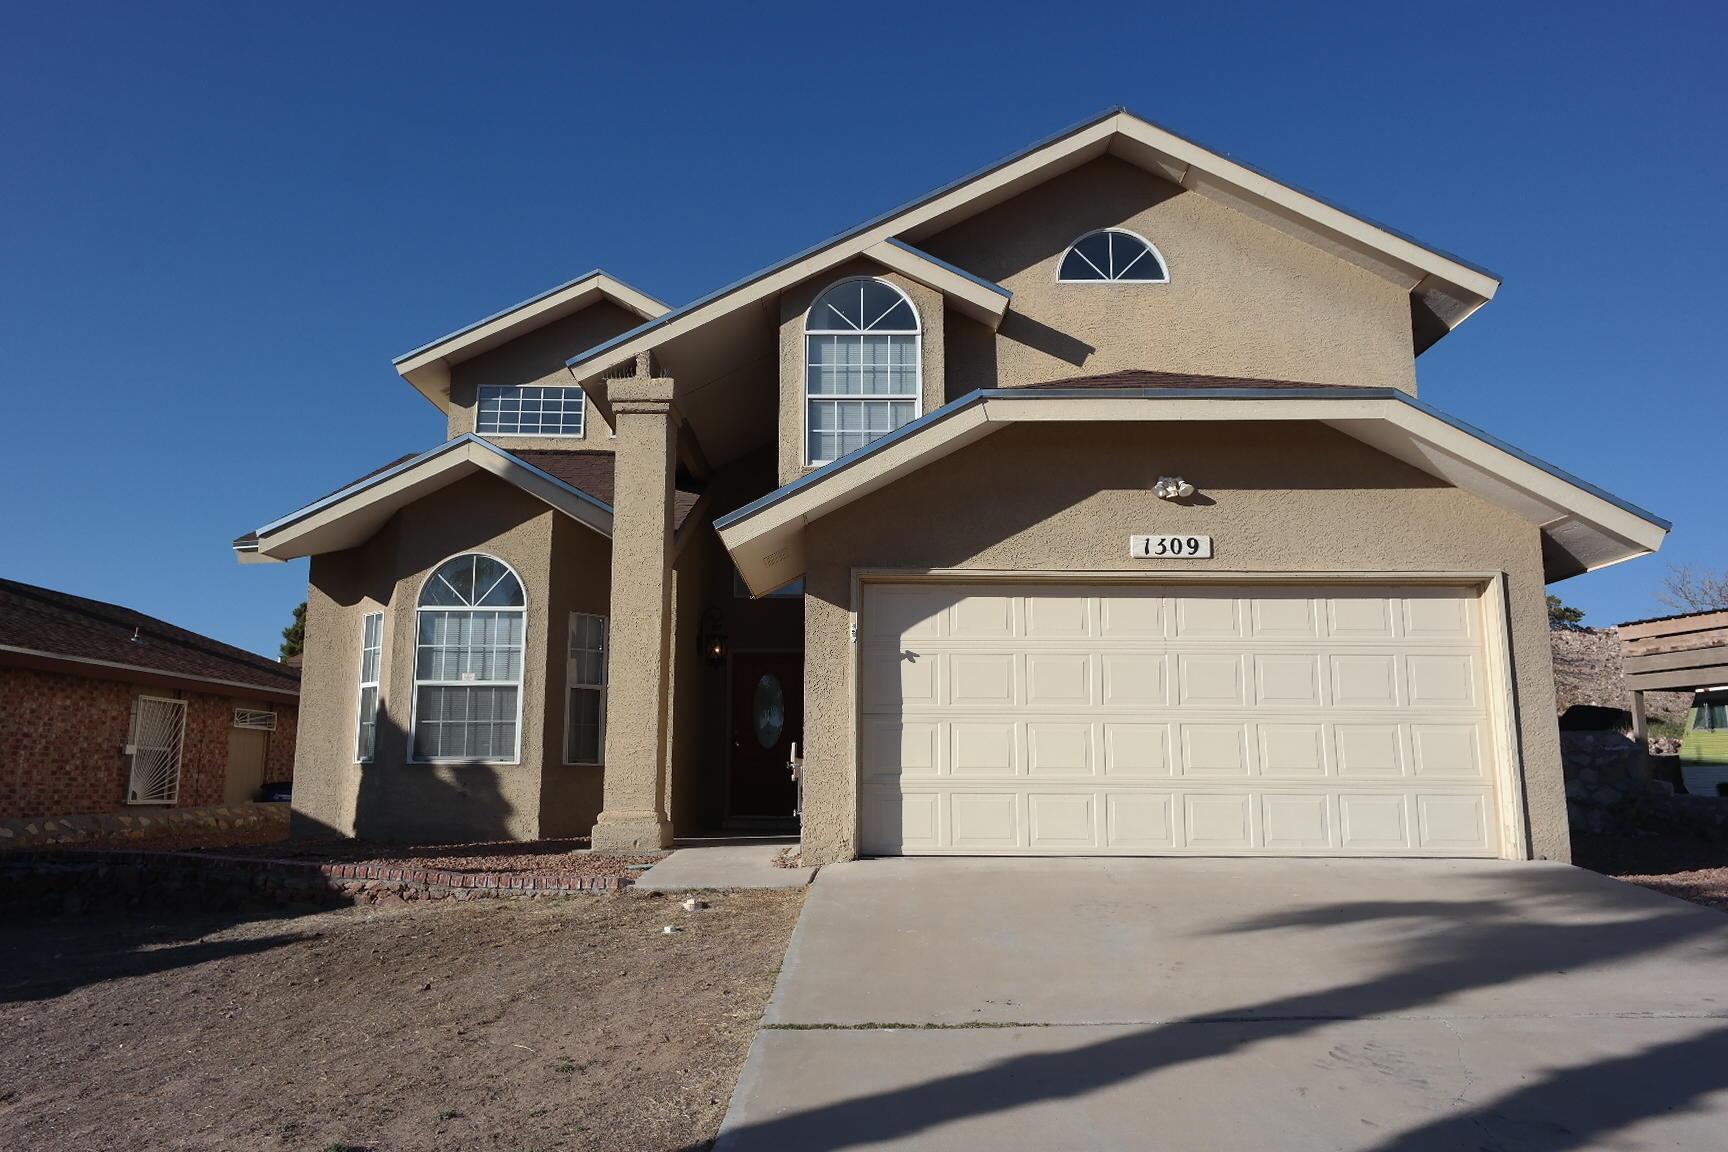 1309 BLACK RIDGE, El Paso, Texas 79912, 3 Bedrooms Bedrooms, ,3 BathroomsBathrooms,Residential,For sale,BLACK RIDGE,803083